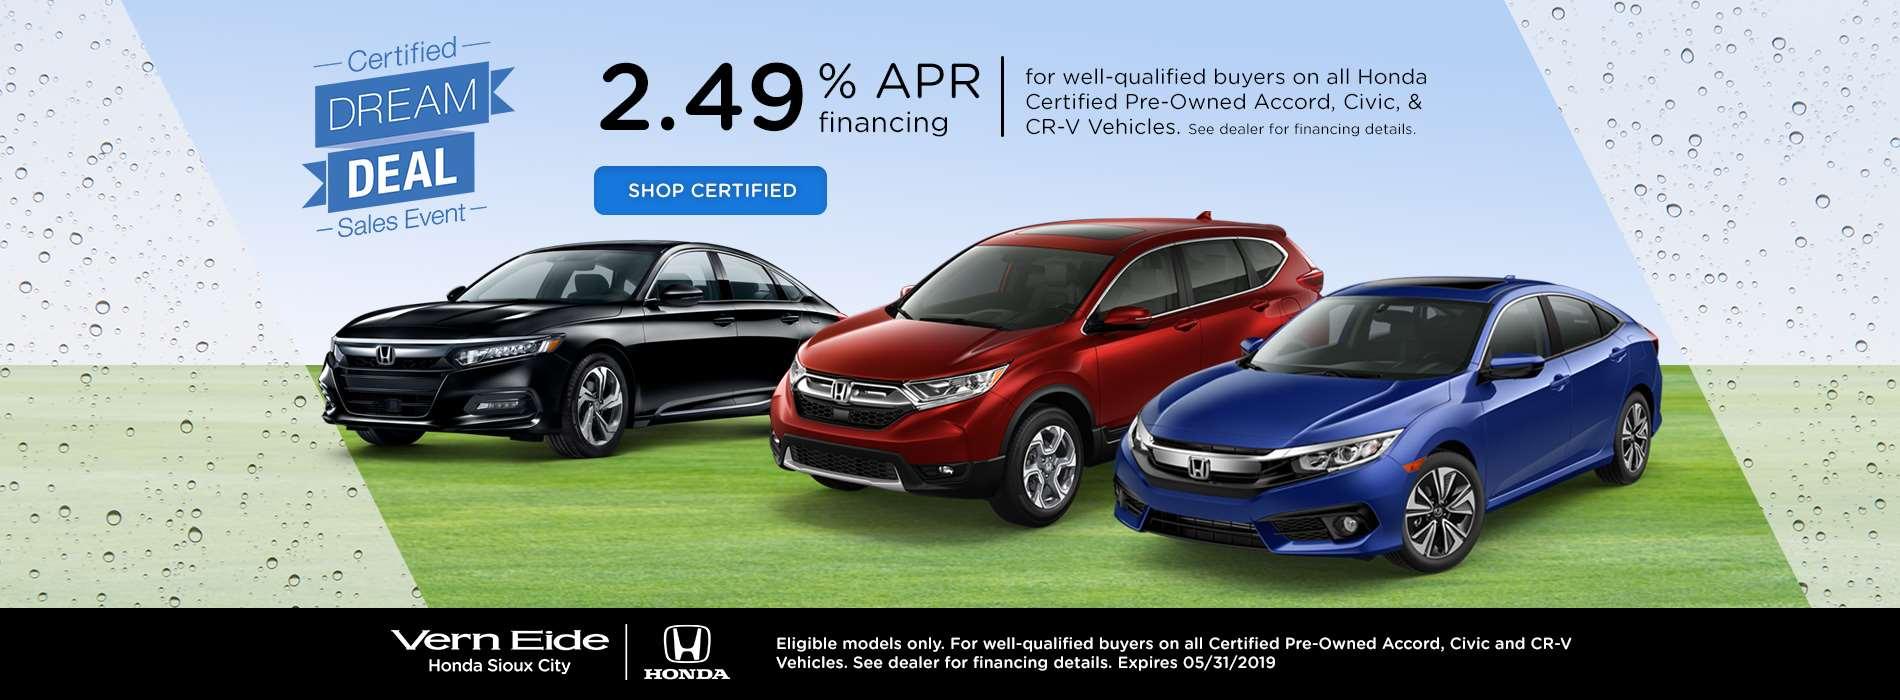 Honda SC - HCPV - May 2019